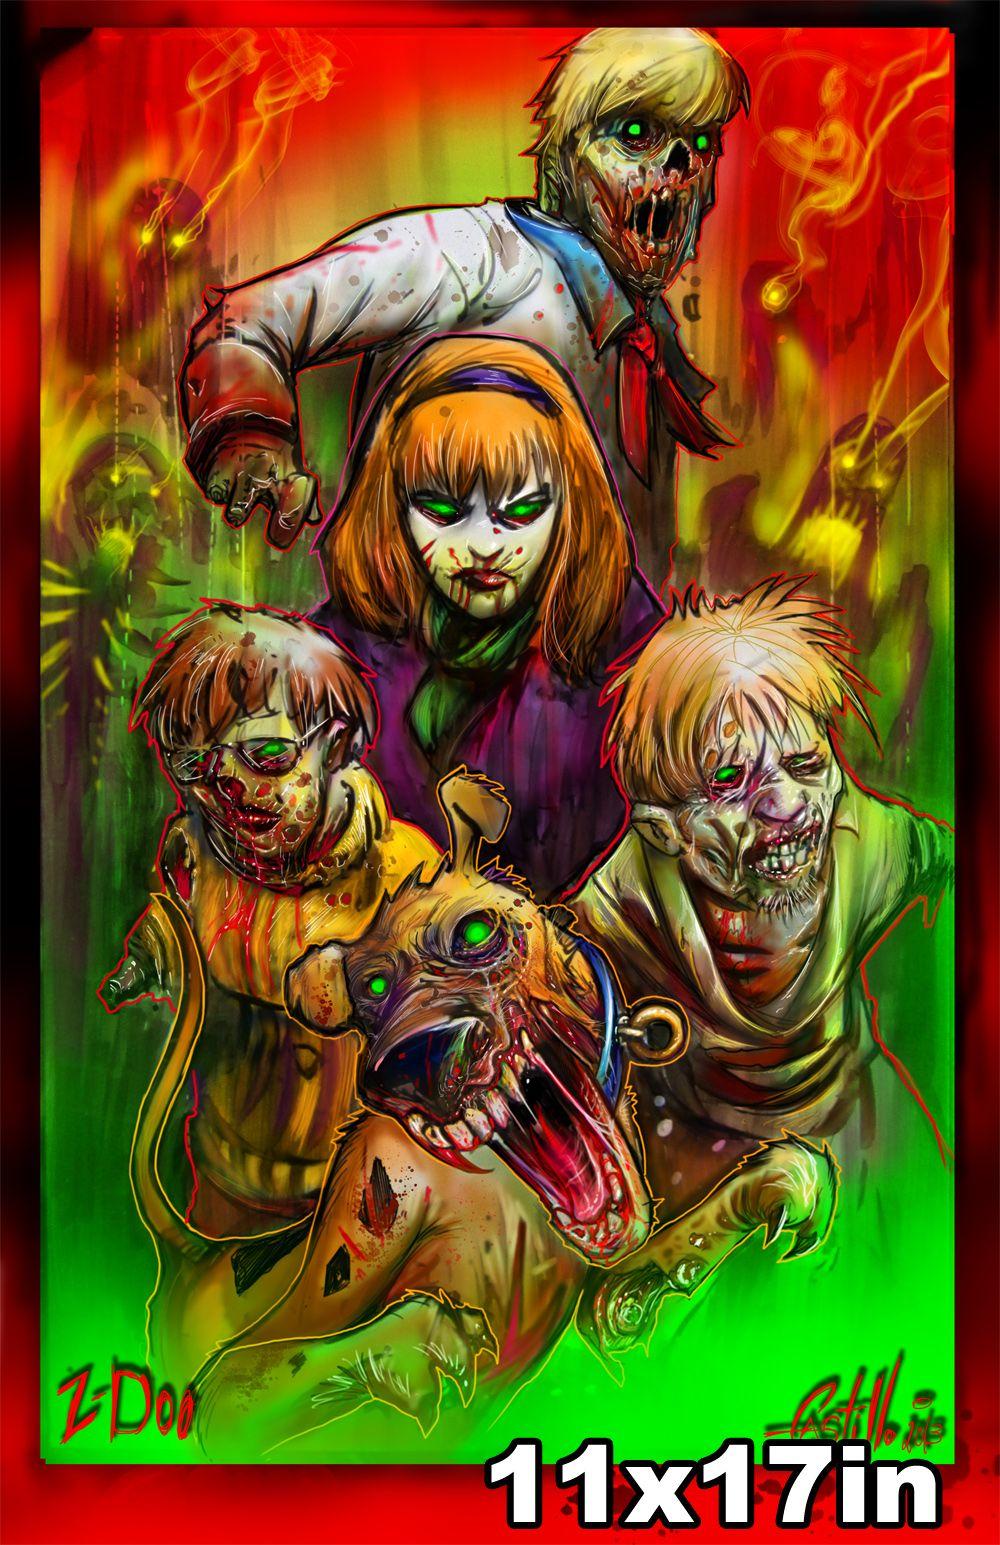 """Zdoo"" in 2020 Zombie cartoon, Zombie art, Scooby doo"